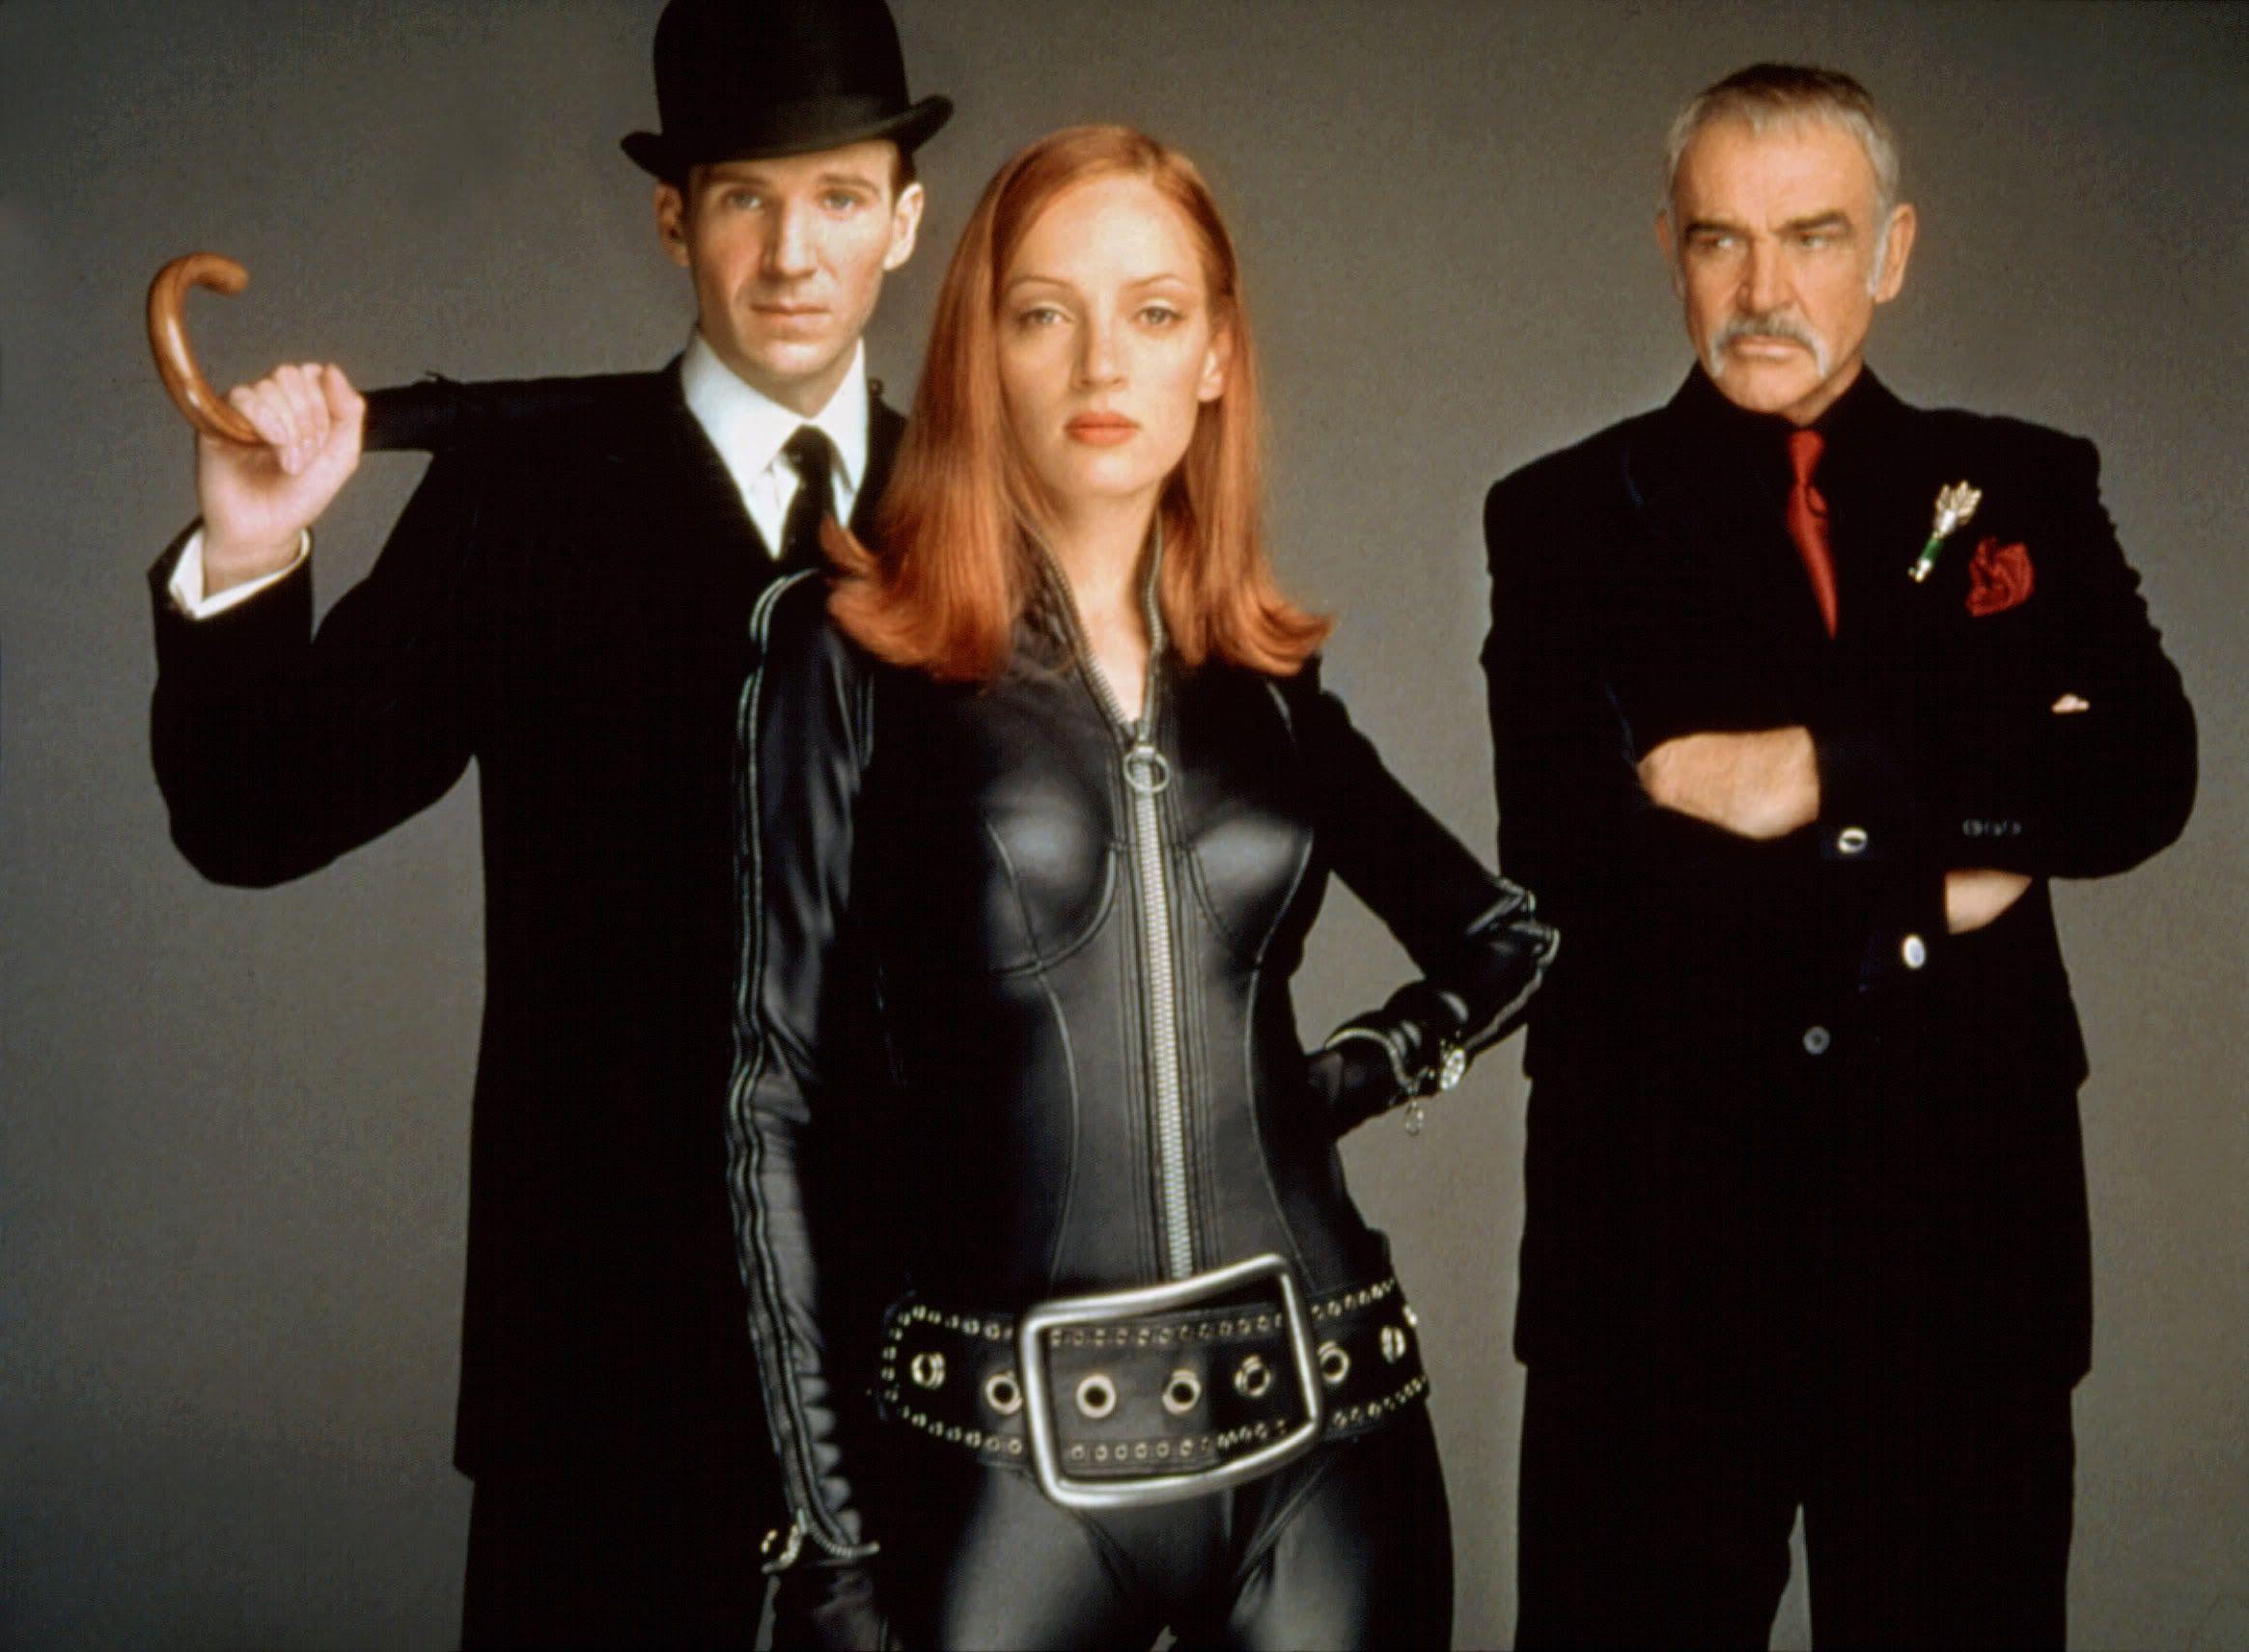 Steed (Ralph Fiennes), Mrs Peel (Uma Thurman) and villain Sir August de Wynter (Sean Connery) in The Avengers (1998)